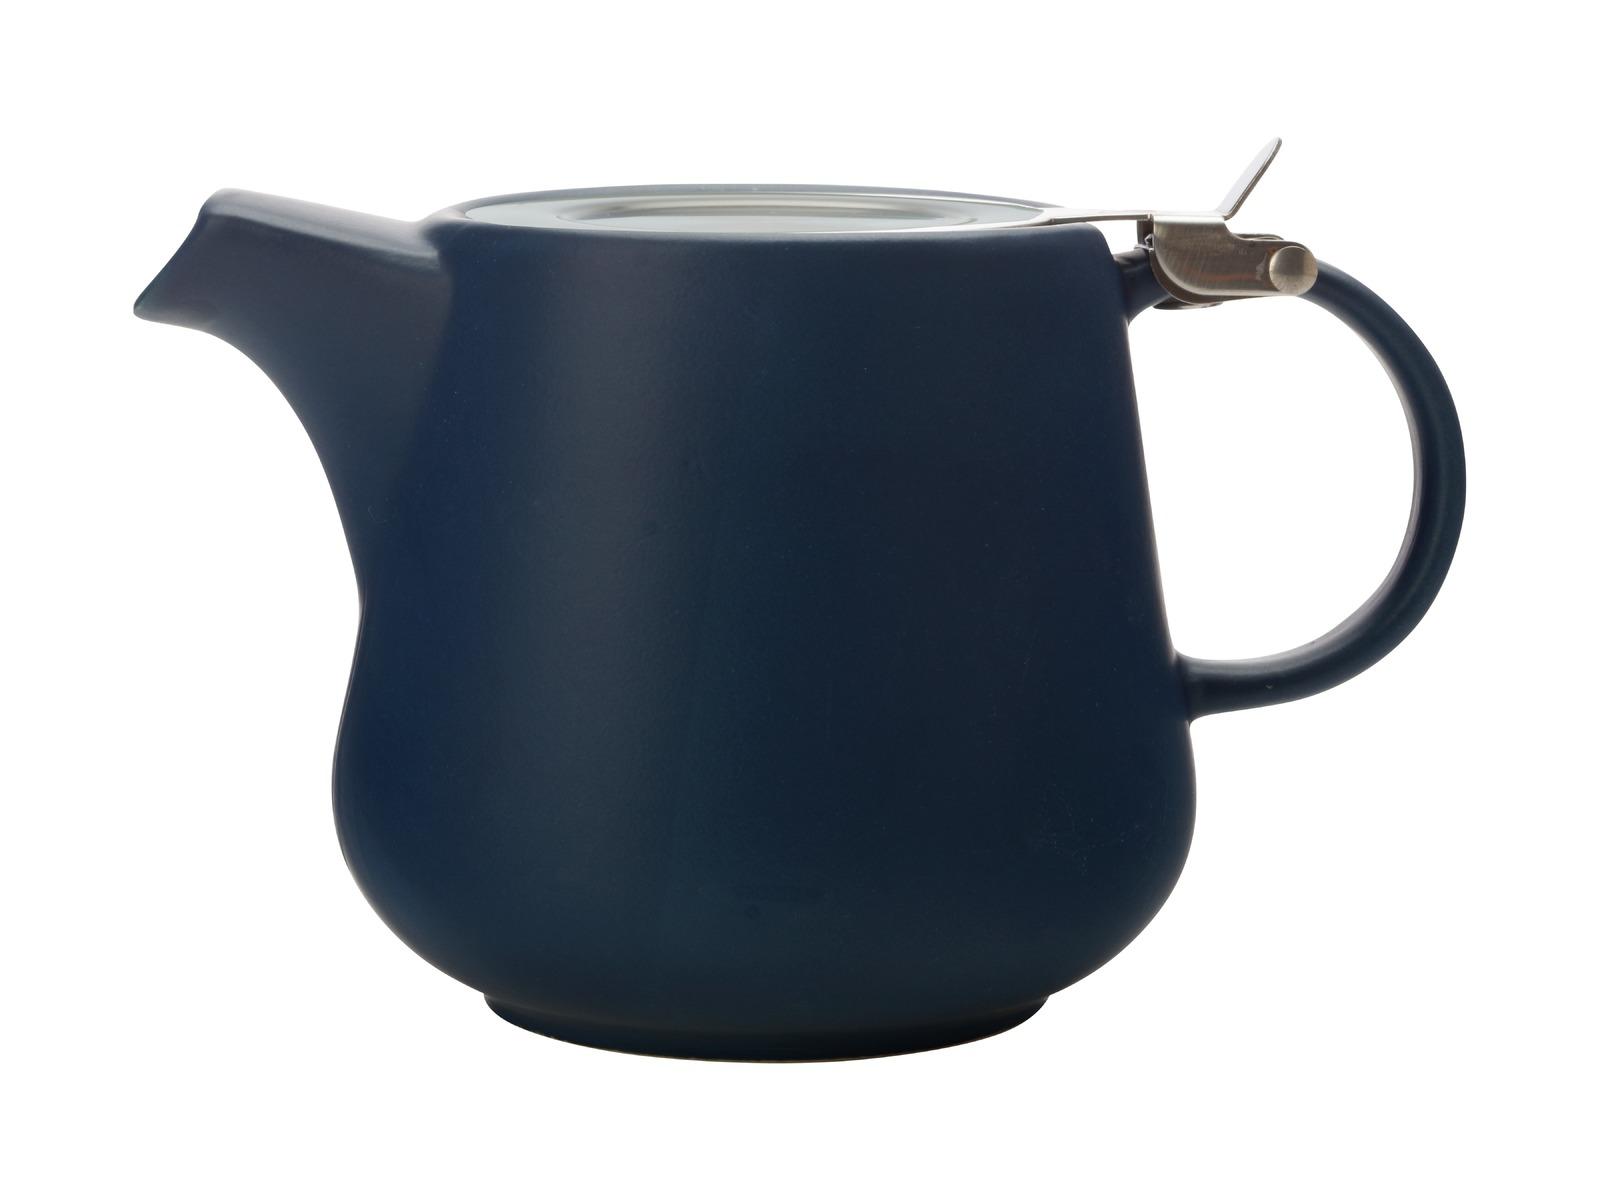 Maxwell & Williams: Tint Teapot (Navy) image